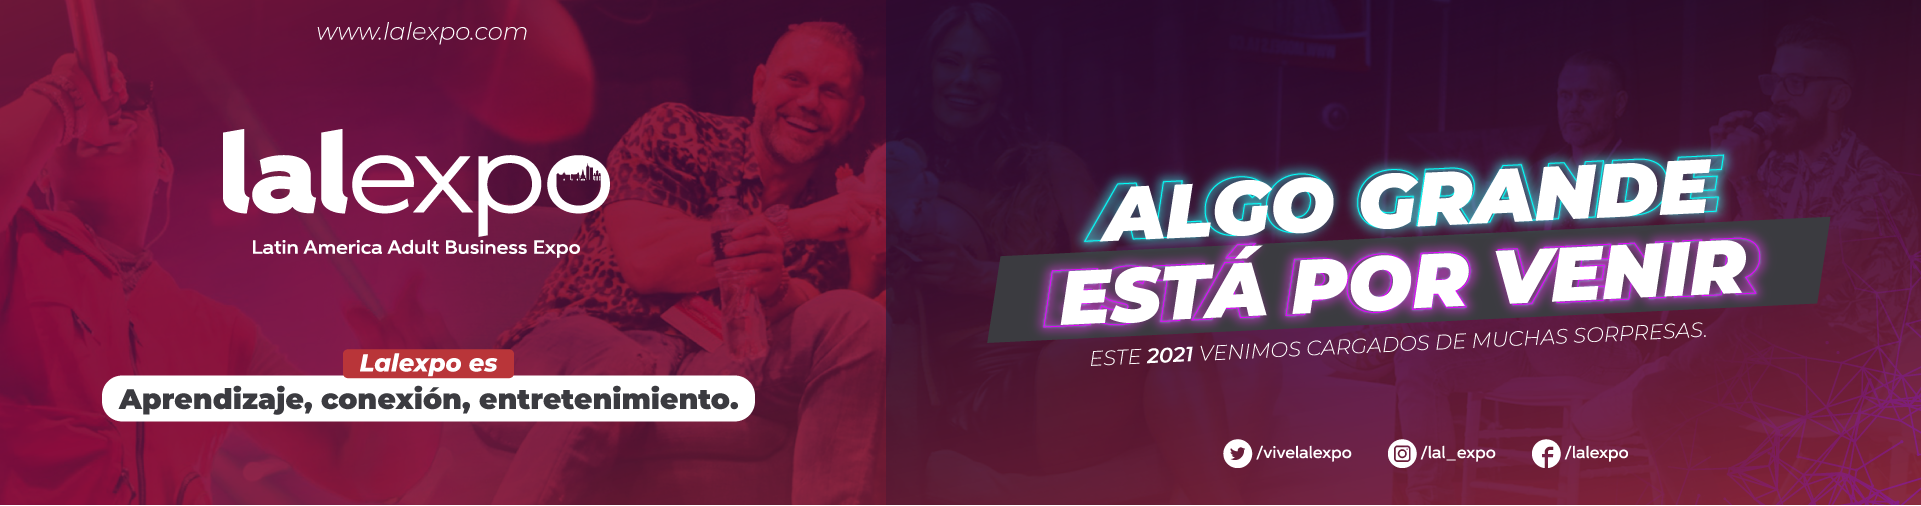 Lalexpo Banner AJ 2021 (1)